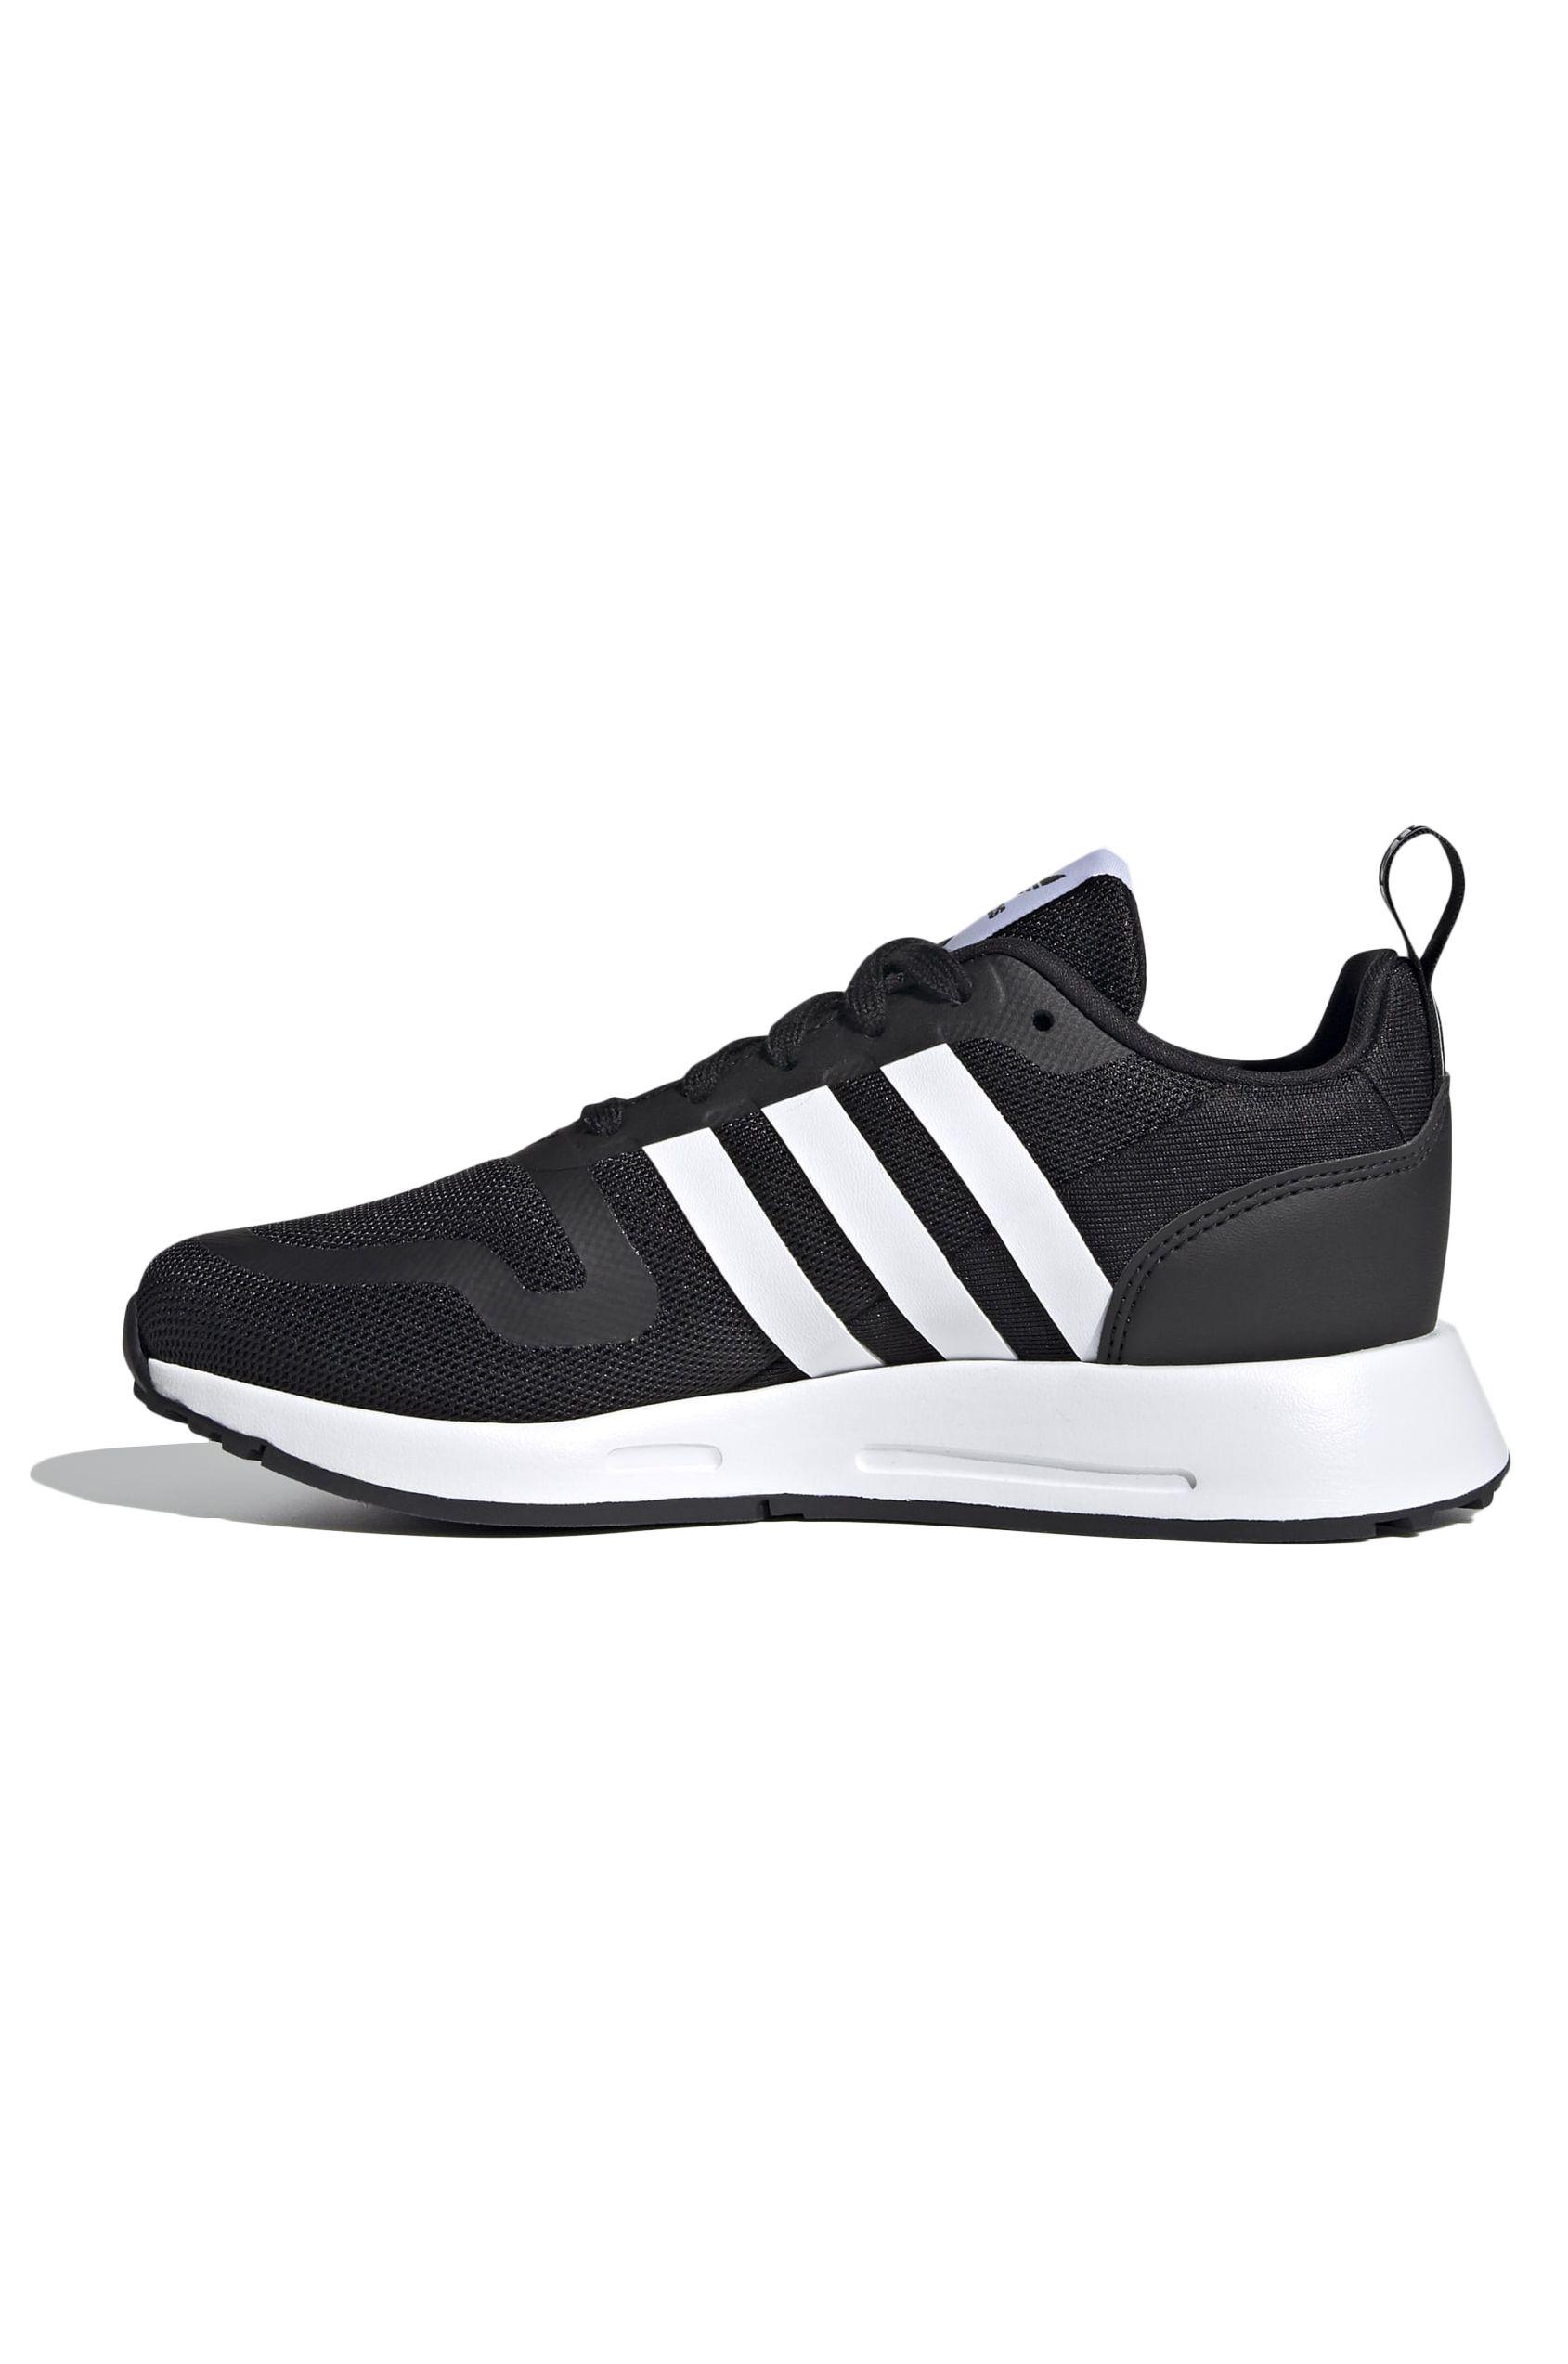 Tenis Adidas SMOOTH RUNNER J Core Black/Ftwr White/Core Black